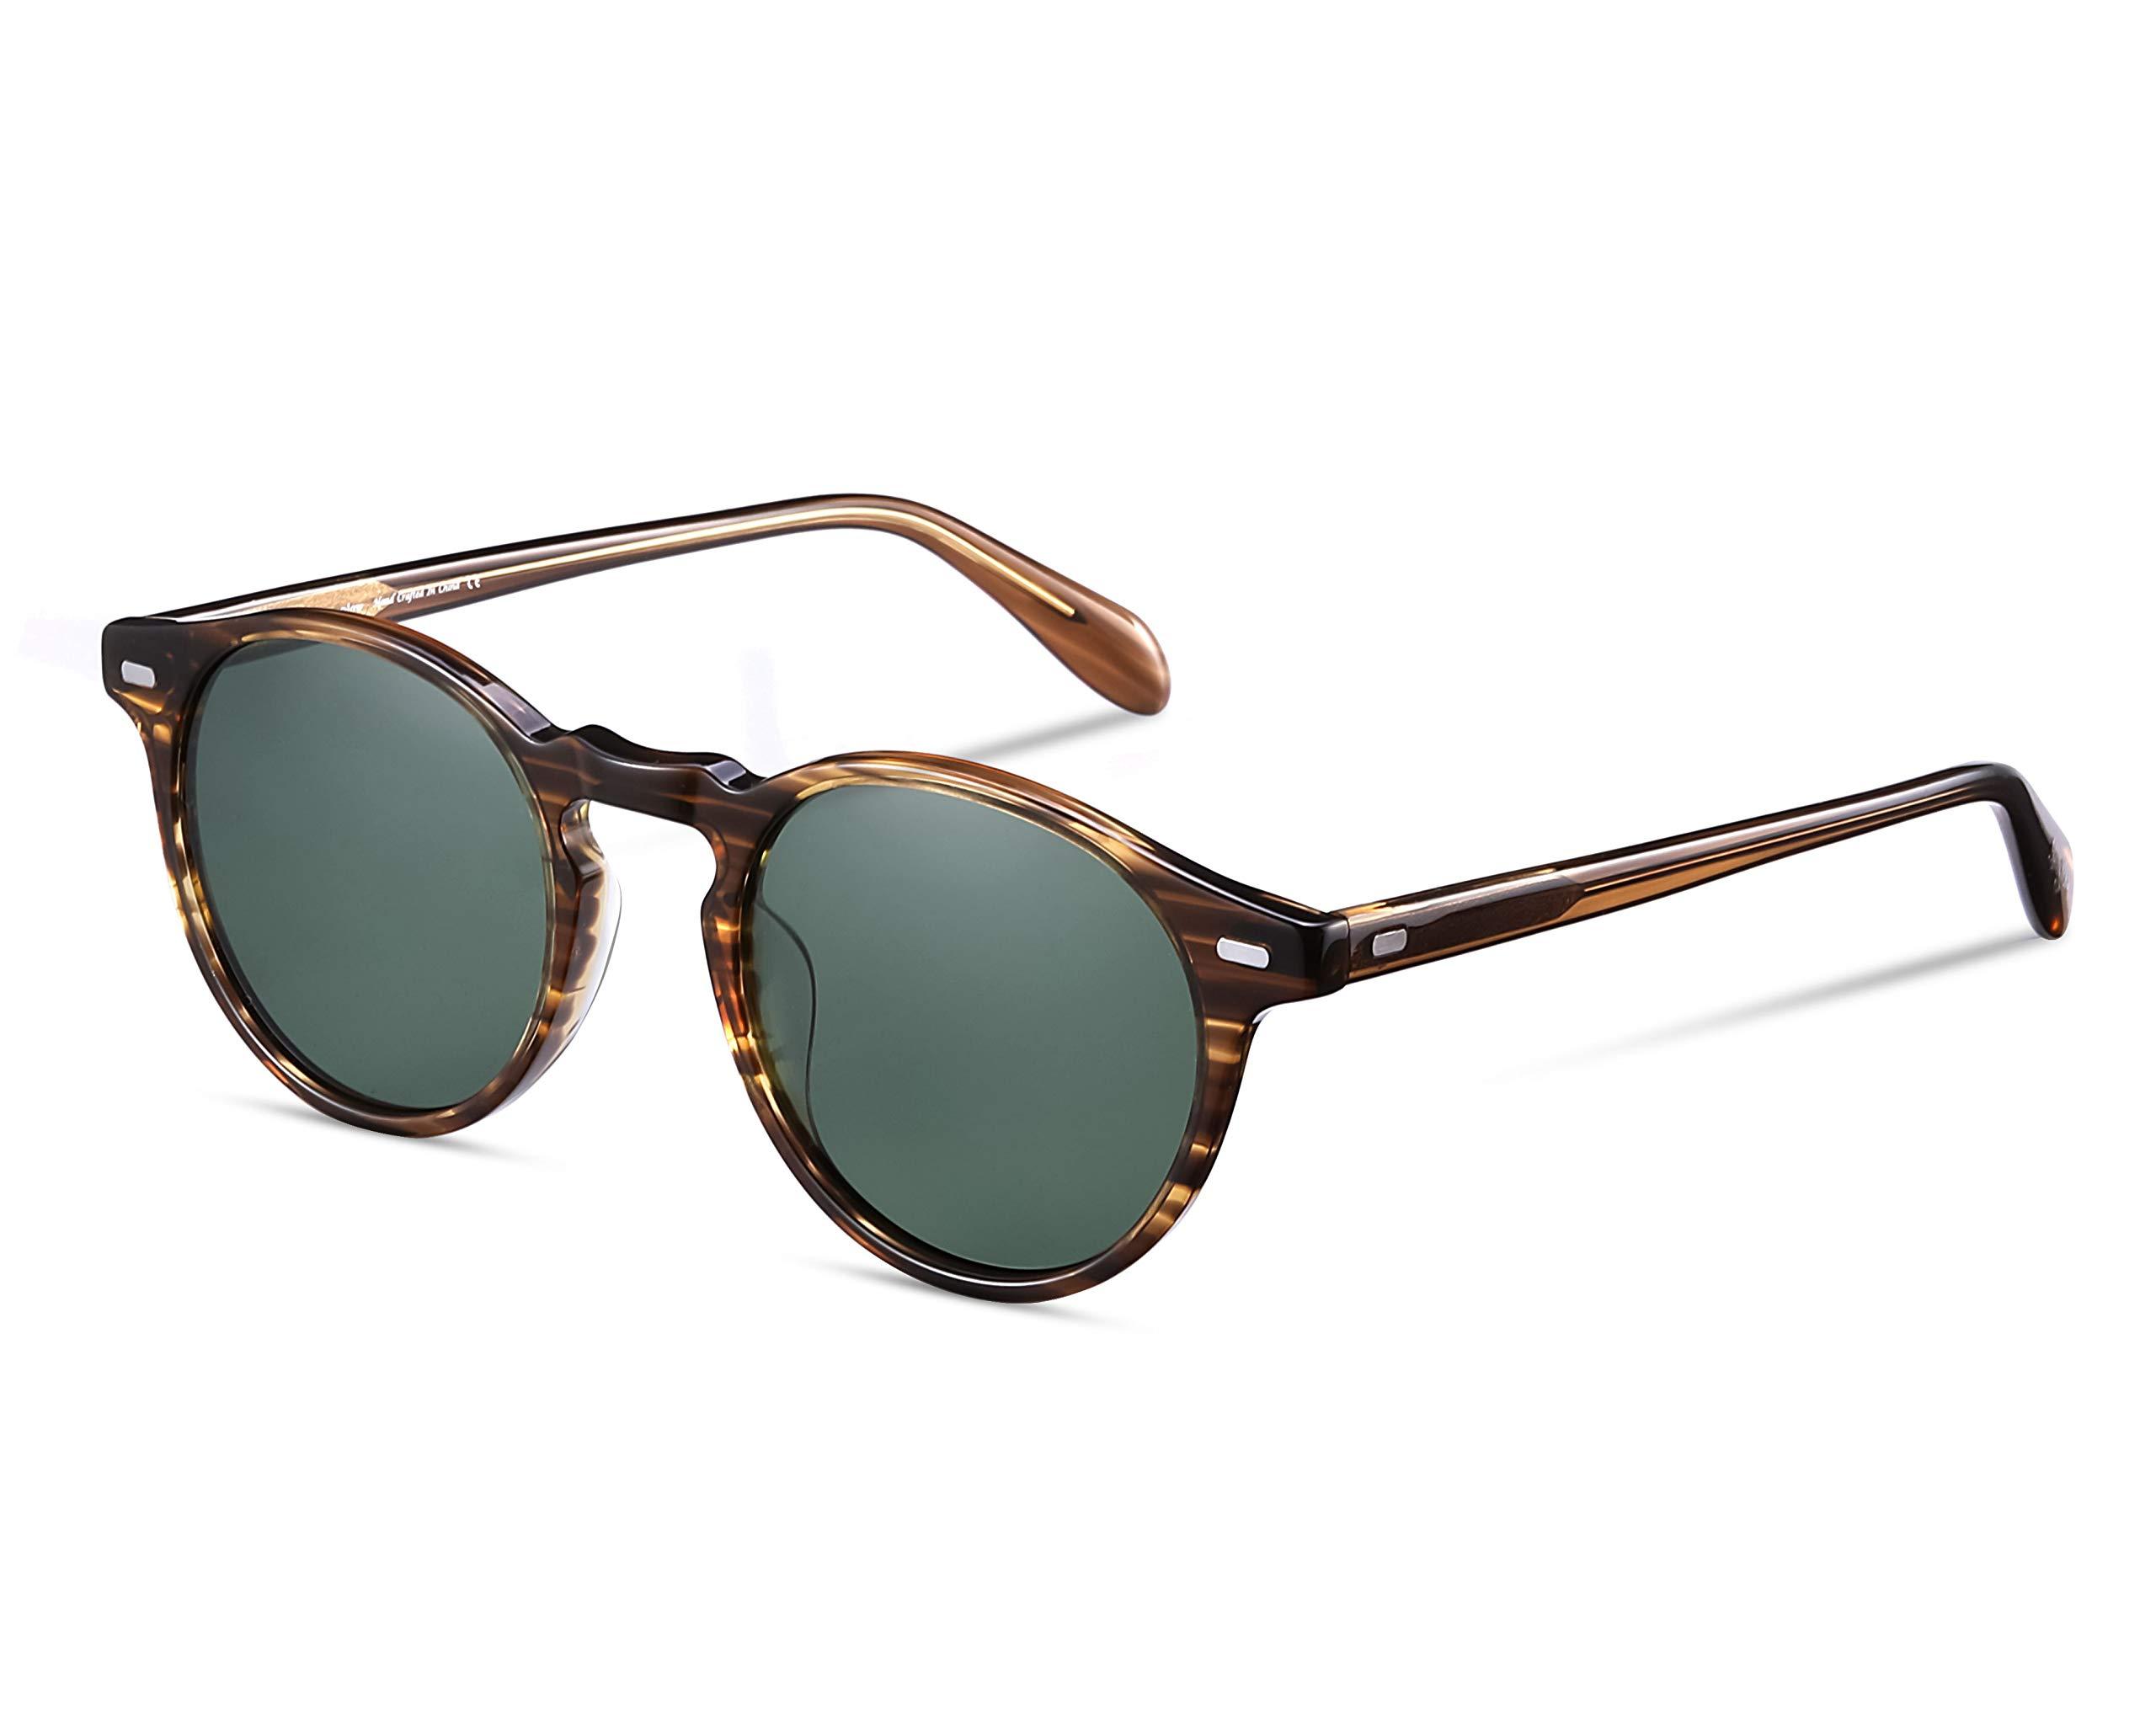 EyeGlow Vintage Round Sunglasses Women Sunglasses Men Polarized Lens 5187 Acetate material (Blonde vs green polarized lens, As pictures) by EyeGlow (Image #1)